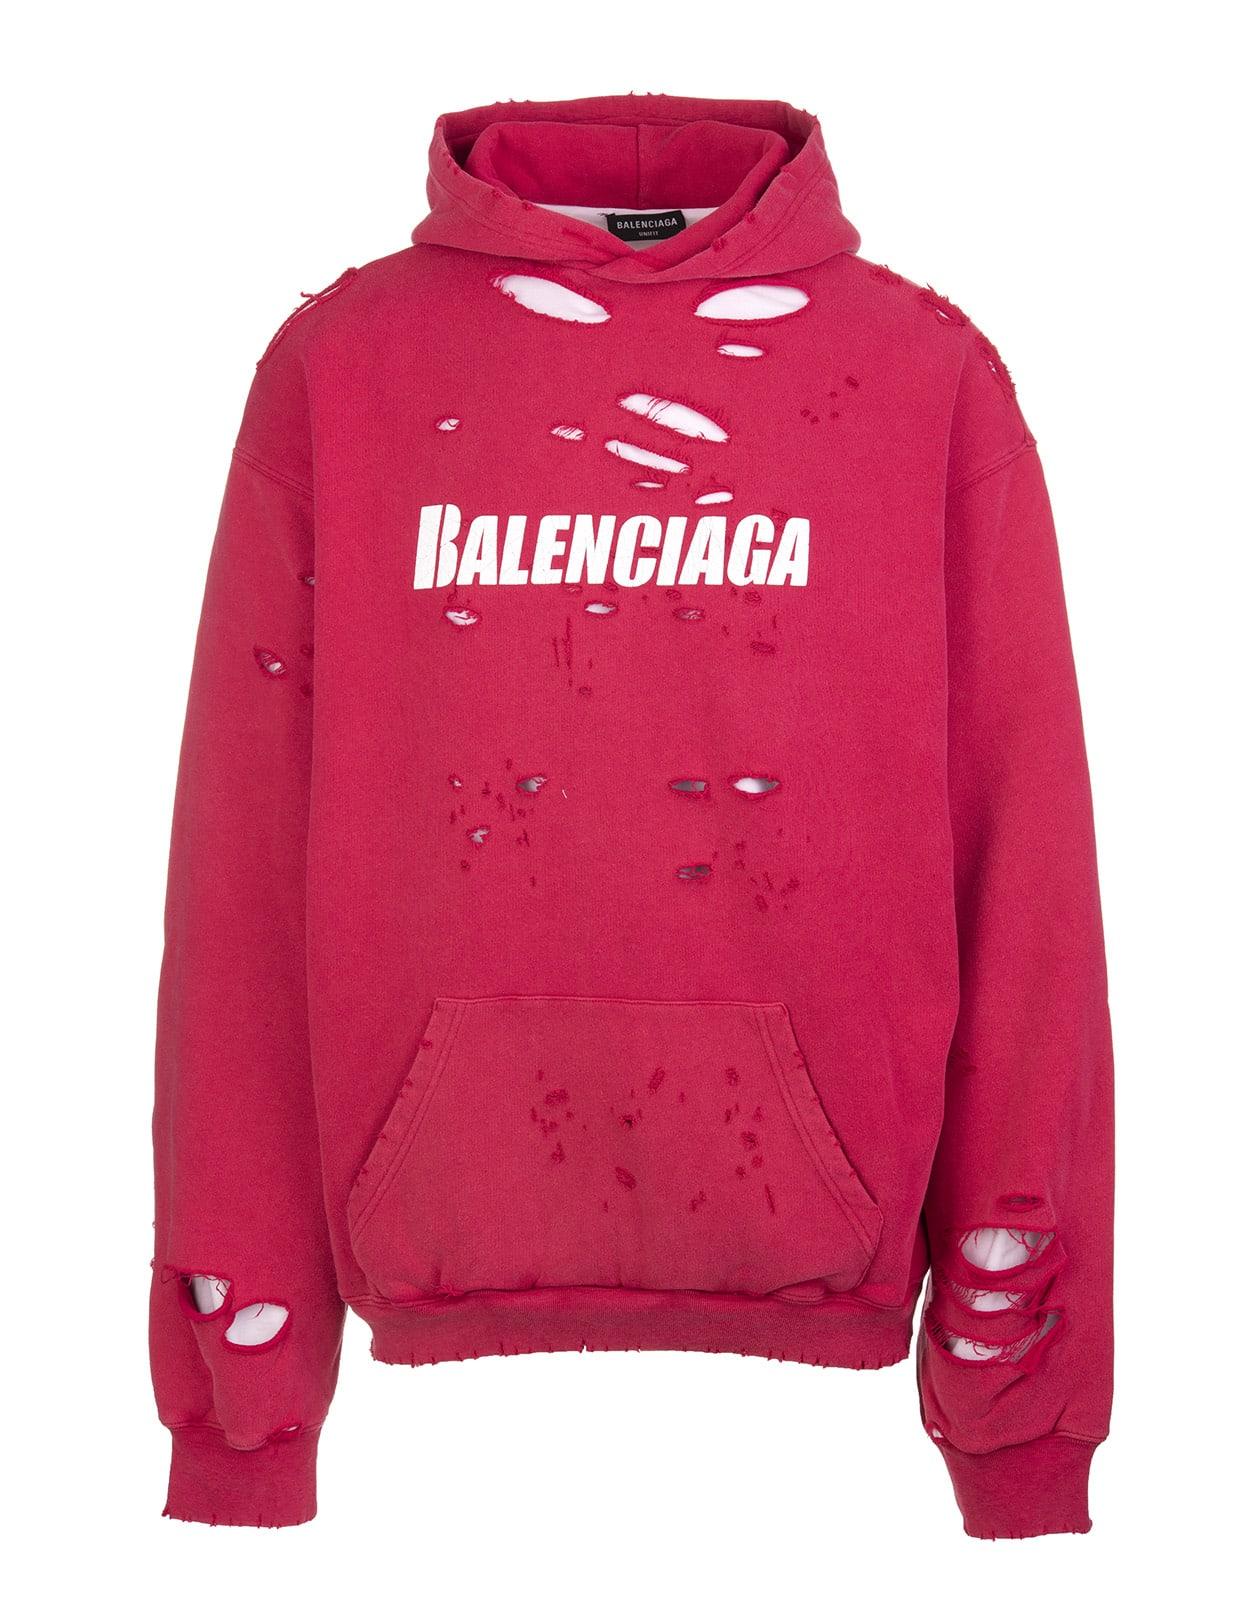 Balenciaga Hoodies UNISEX RED CAPS DESTROYED HOODIE